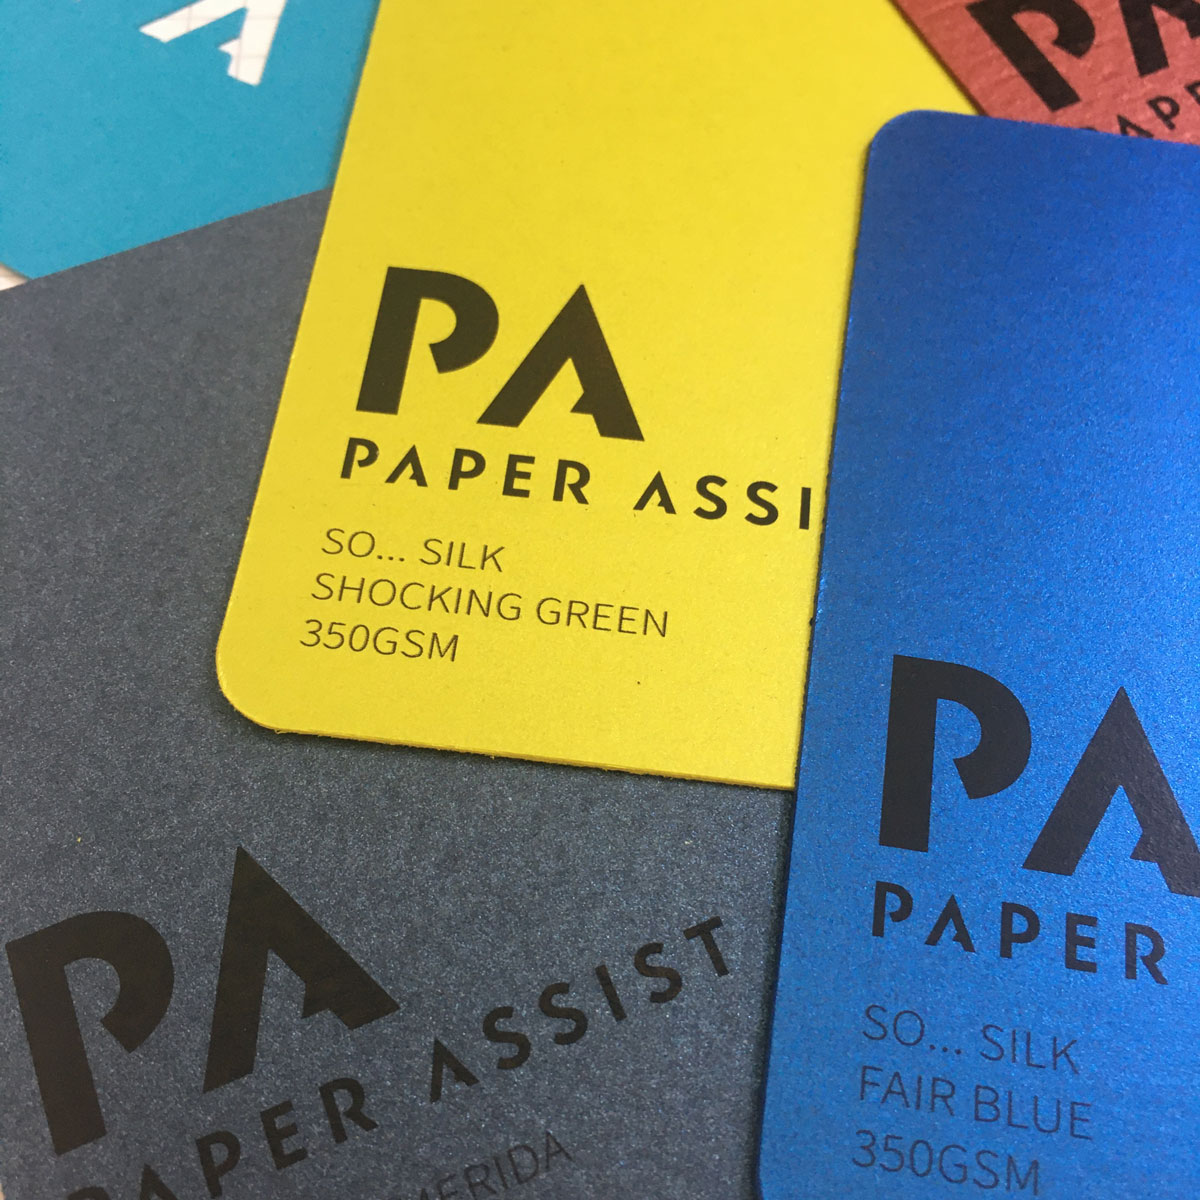 PA Packaging Design Ireland